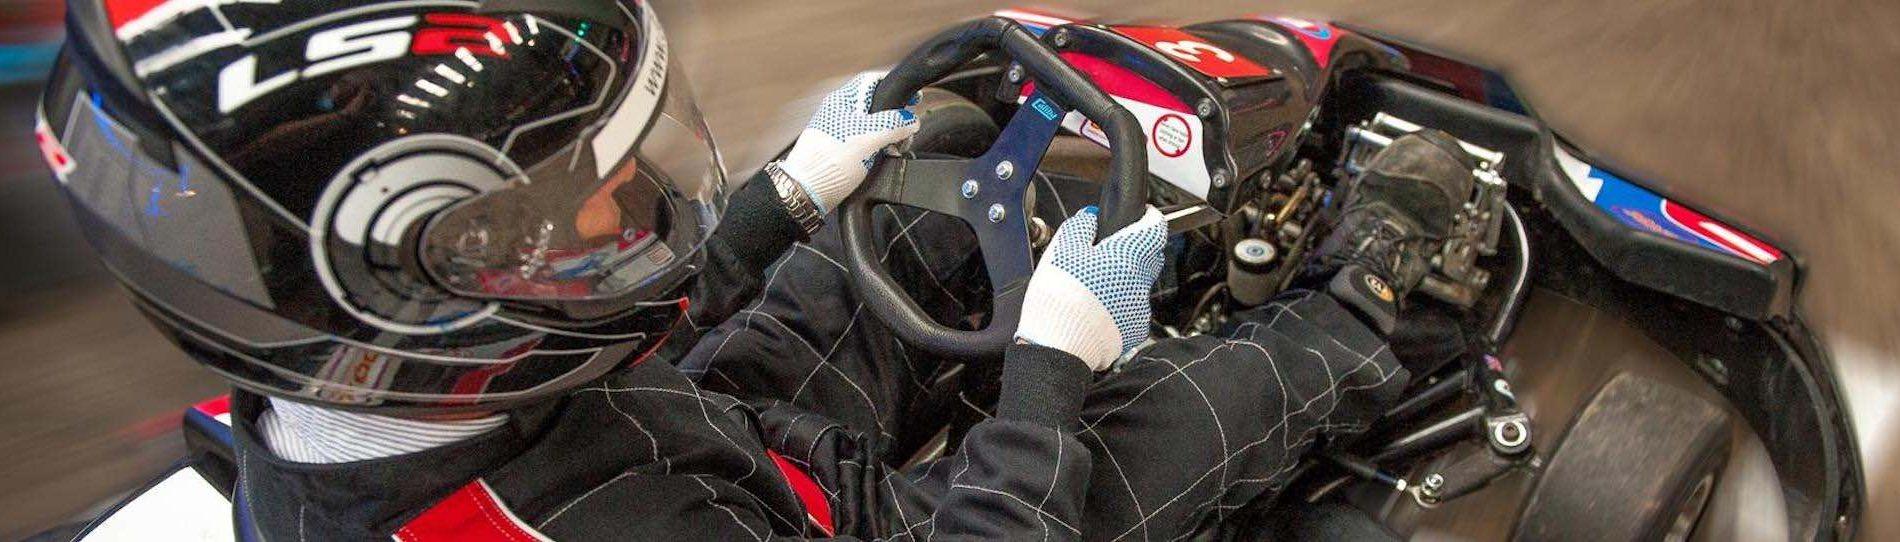 buck racing go kart